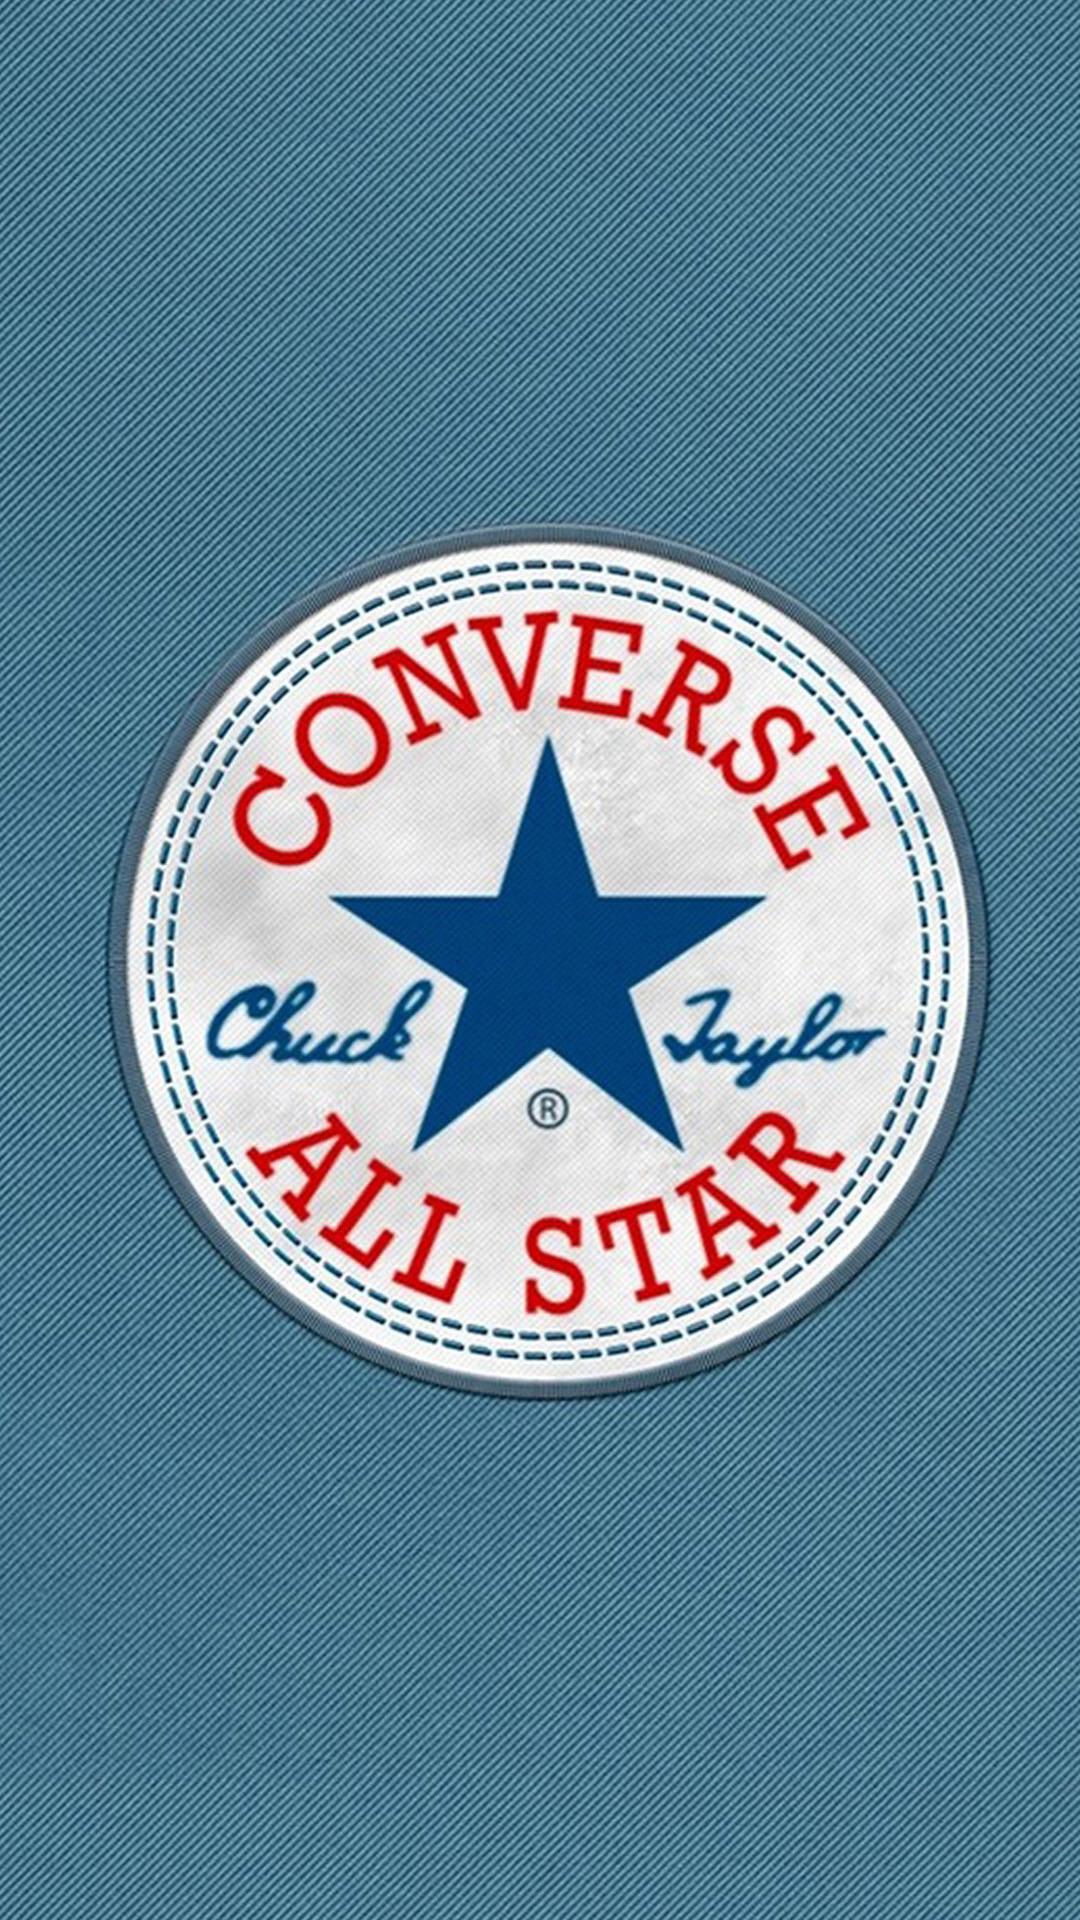 Converse All Star Wallpaper ·① WallpaperTag  Converse All St...